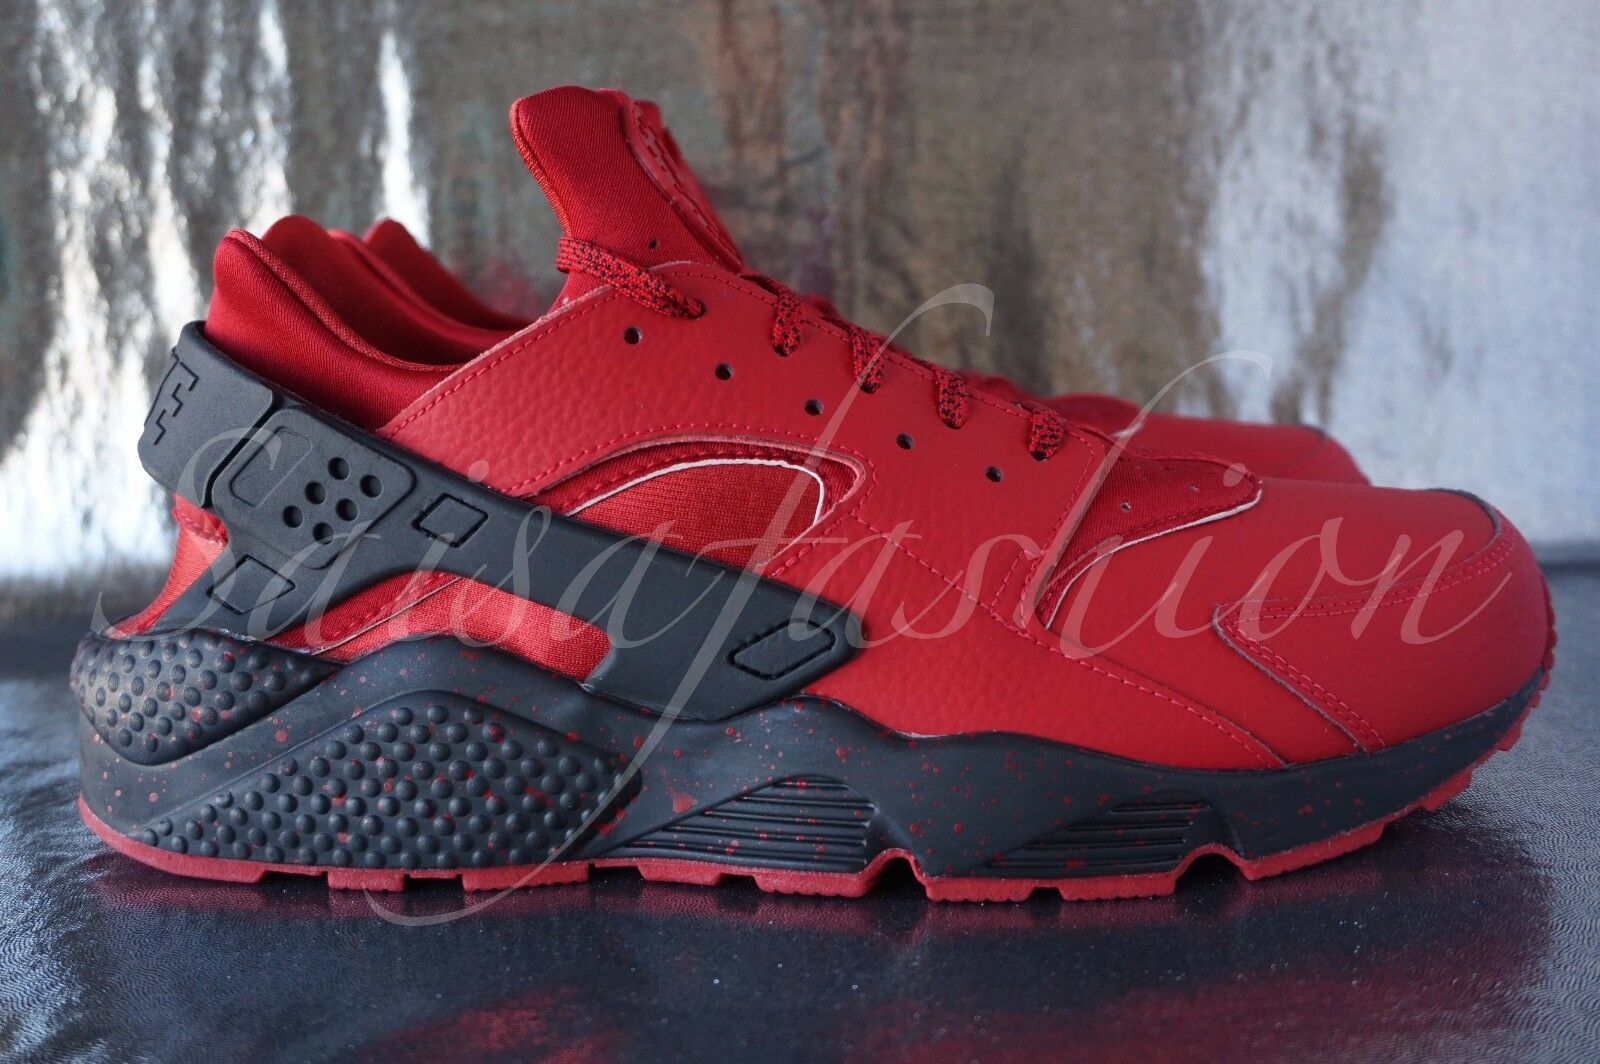 Nike Air Huarache Run iD NikeiD Leather Red October Men's Men's Men's 777330 985 Sz 12.5 971cb6